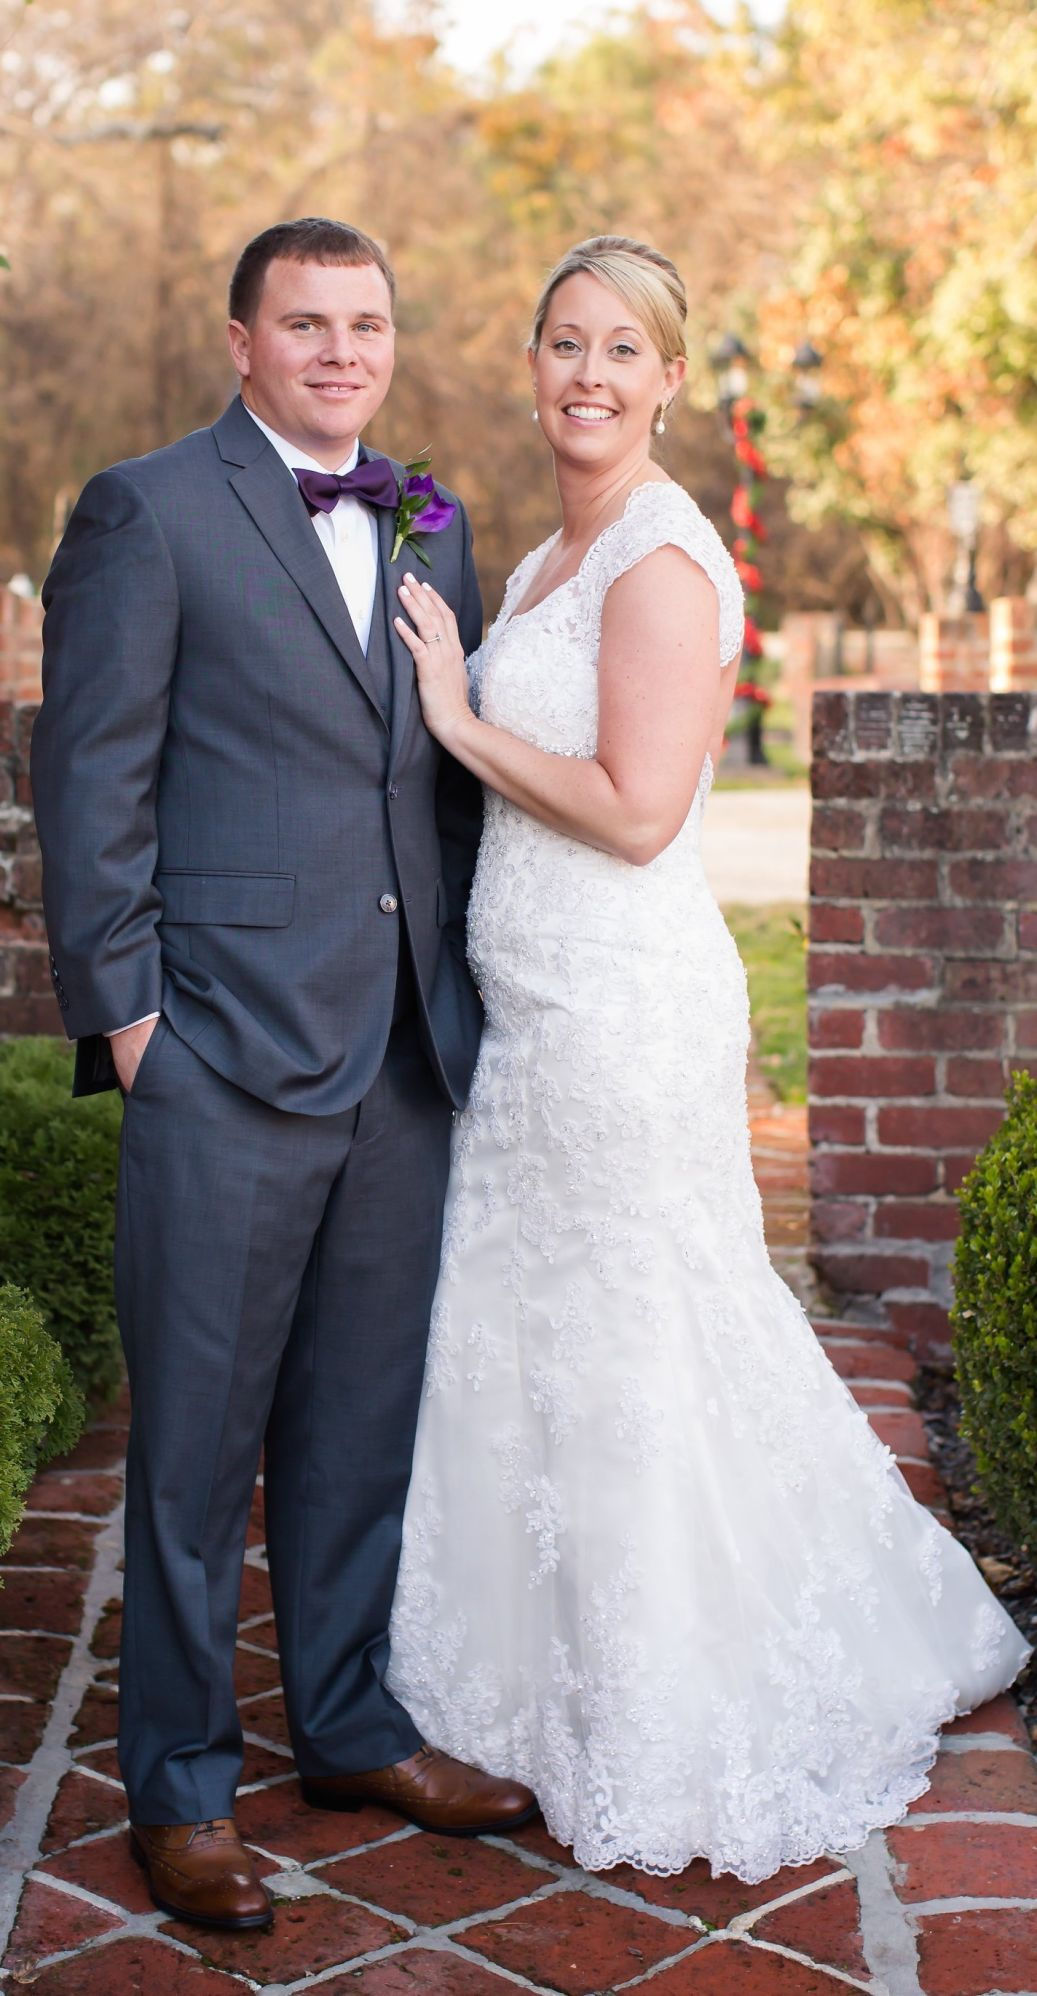 anne jones amp matthew williams weddings amp engagements